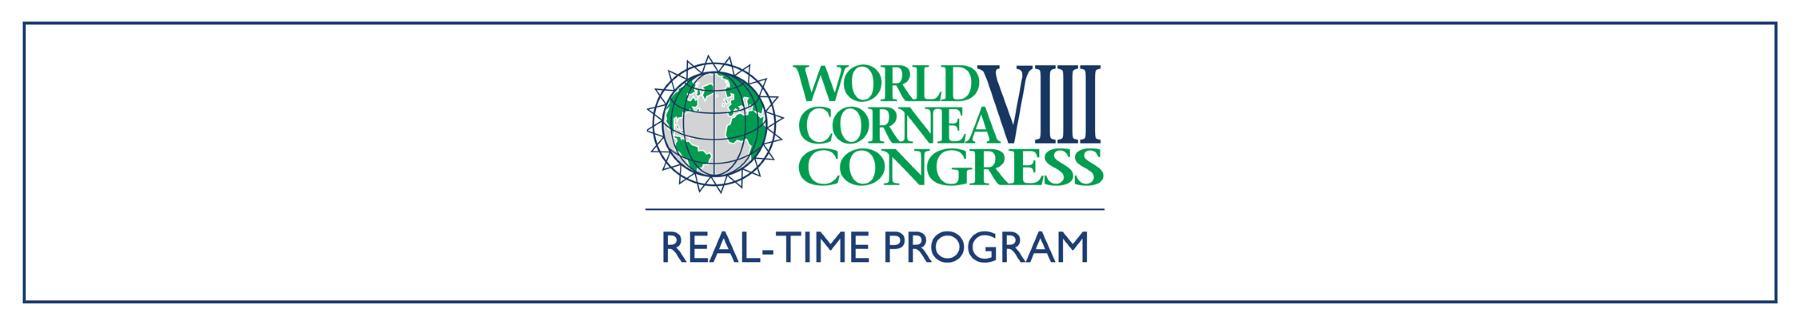 2020 World Cornea Congress